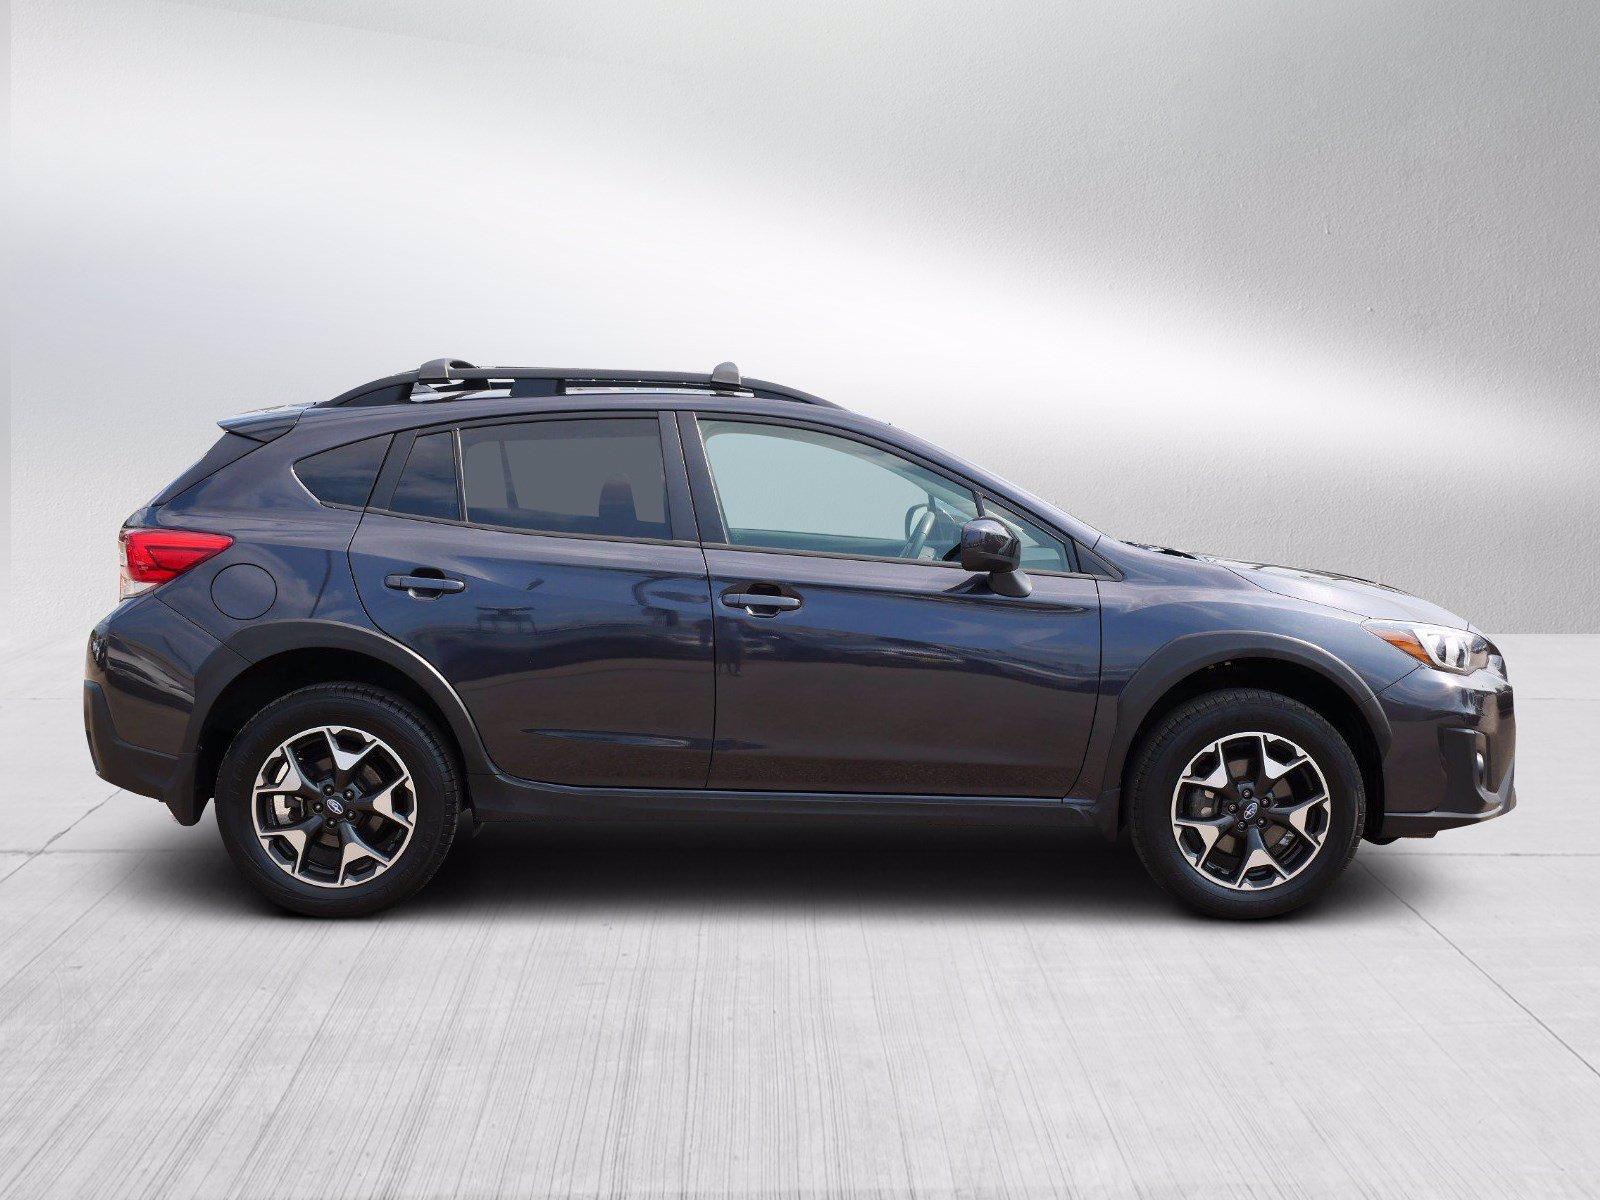 Used 2019 Subaru Crosstrek Premium with VIN JF2GTAEC2K8285742 for sale in Bloomington, Minnesota